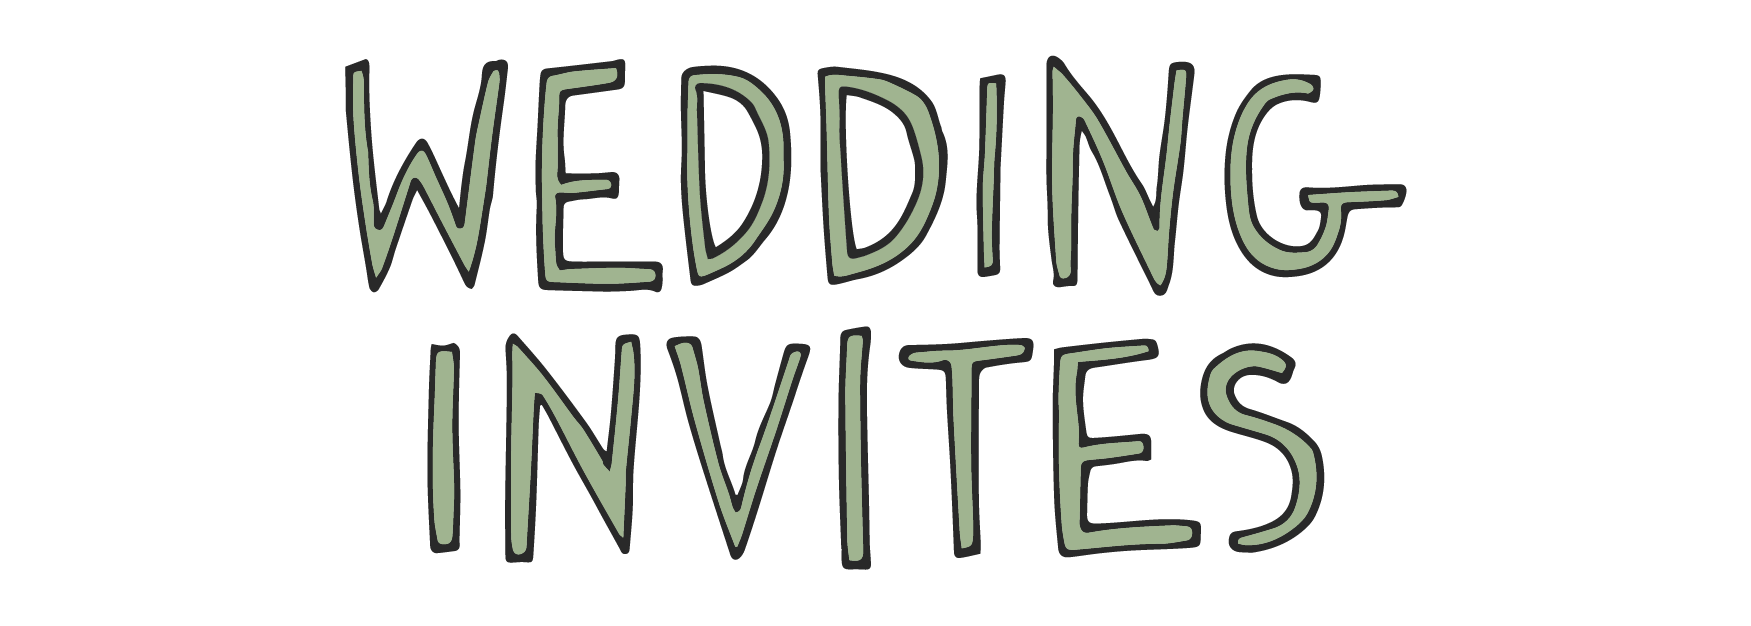 WEDDING INVITES.png